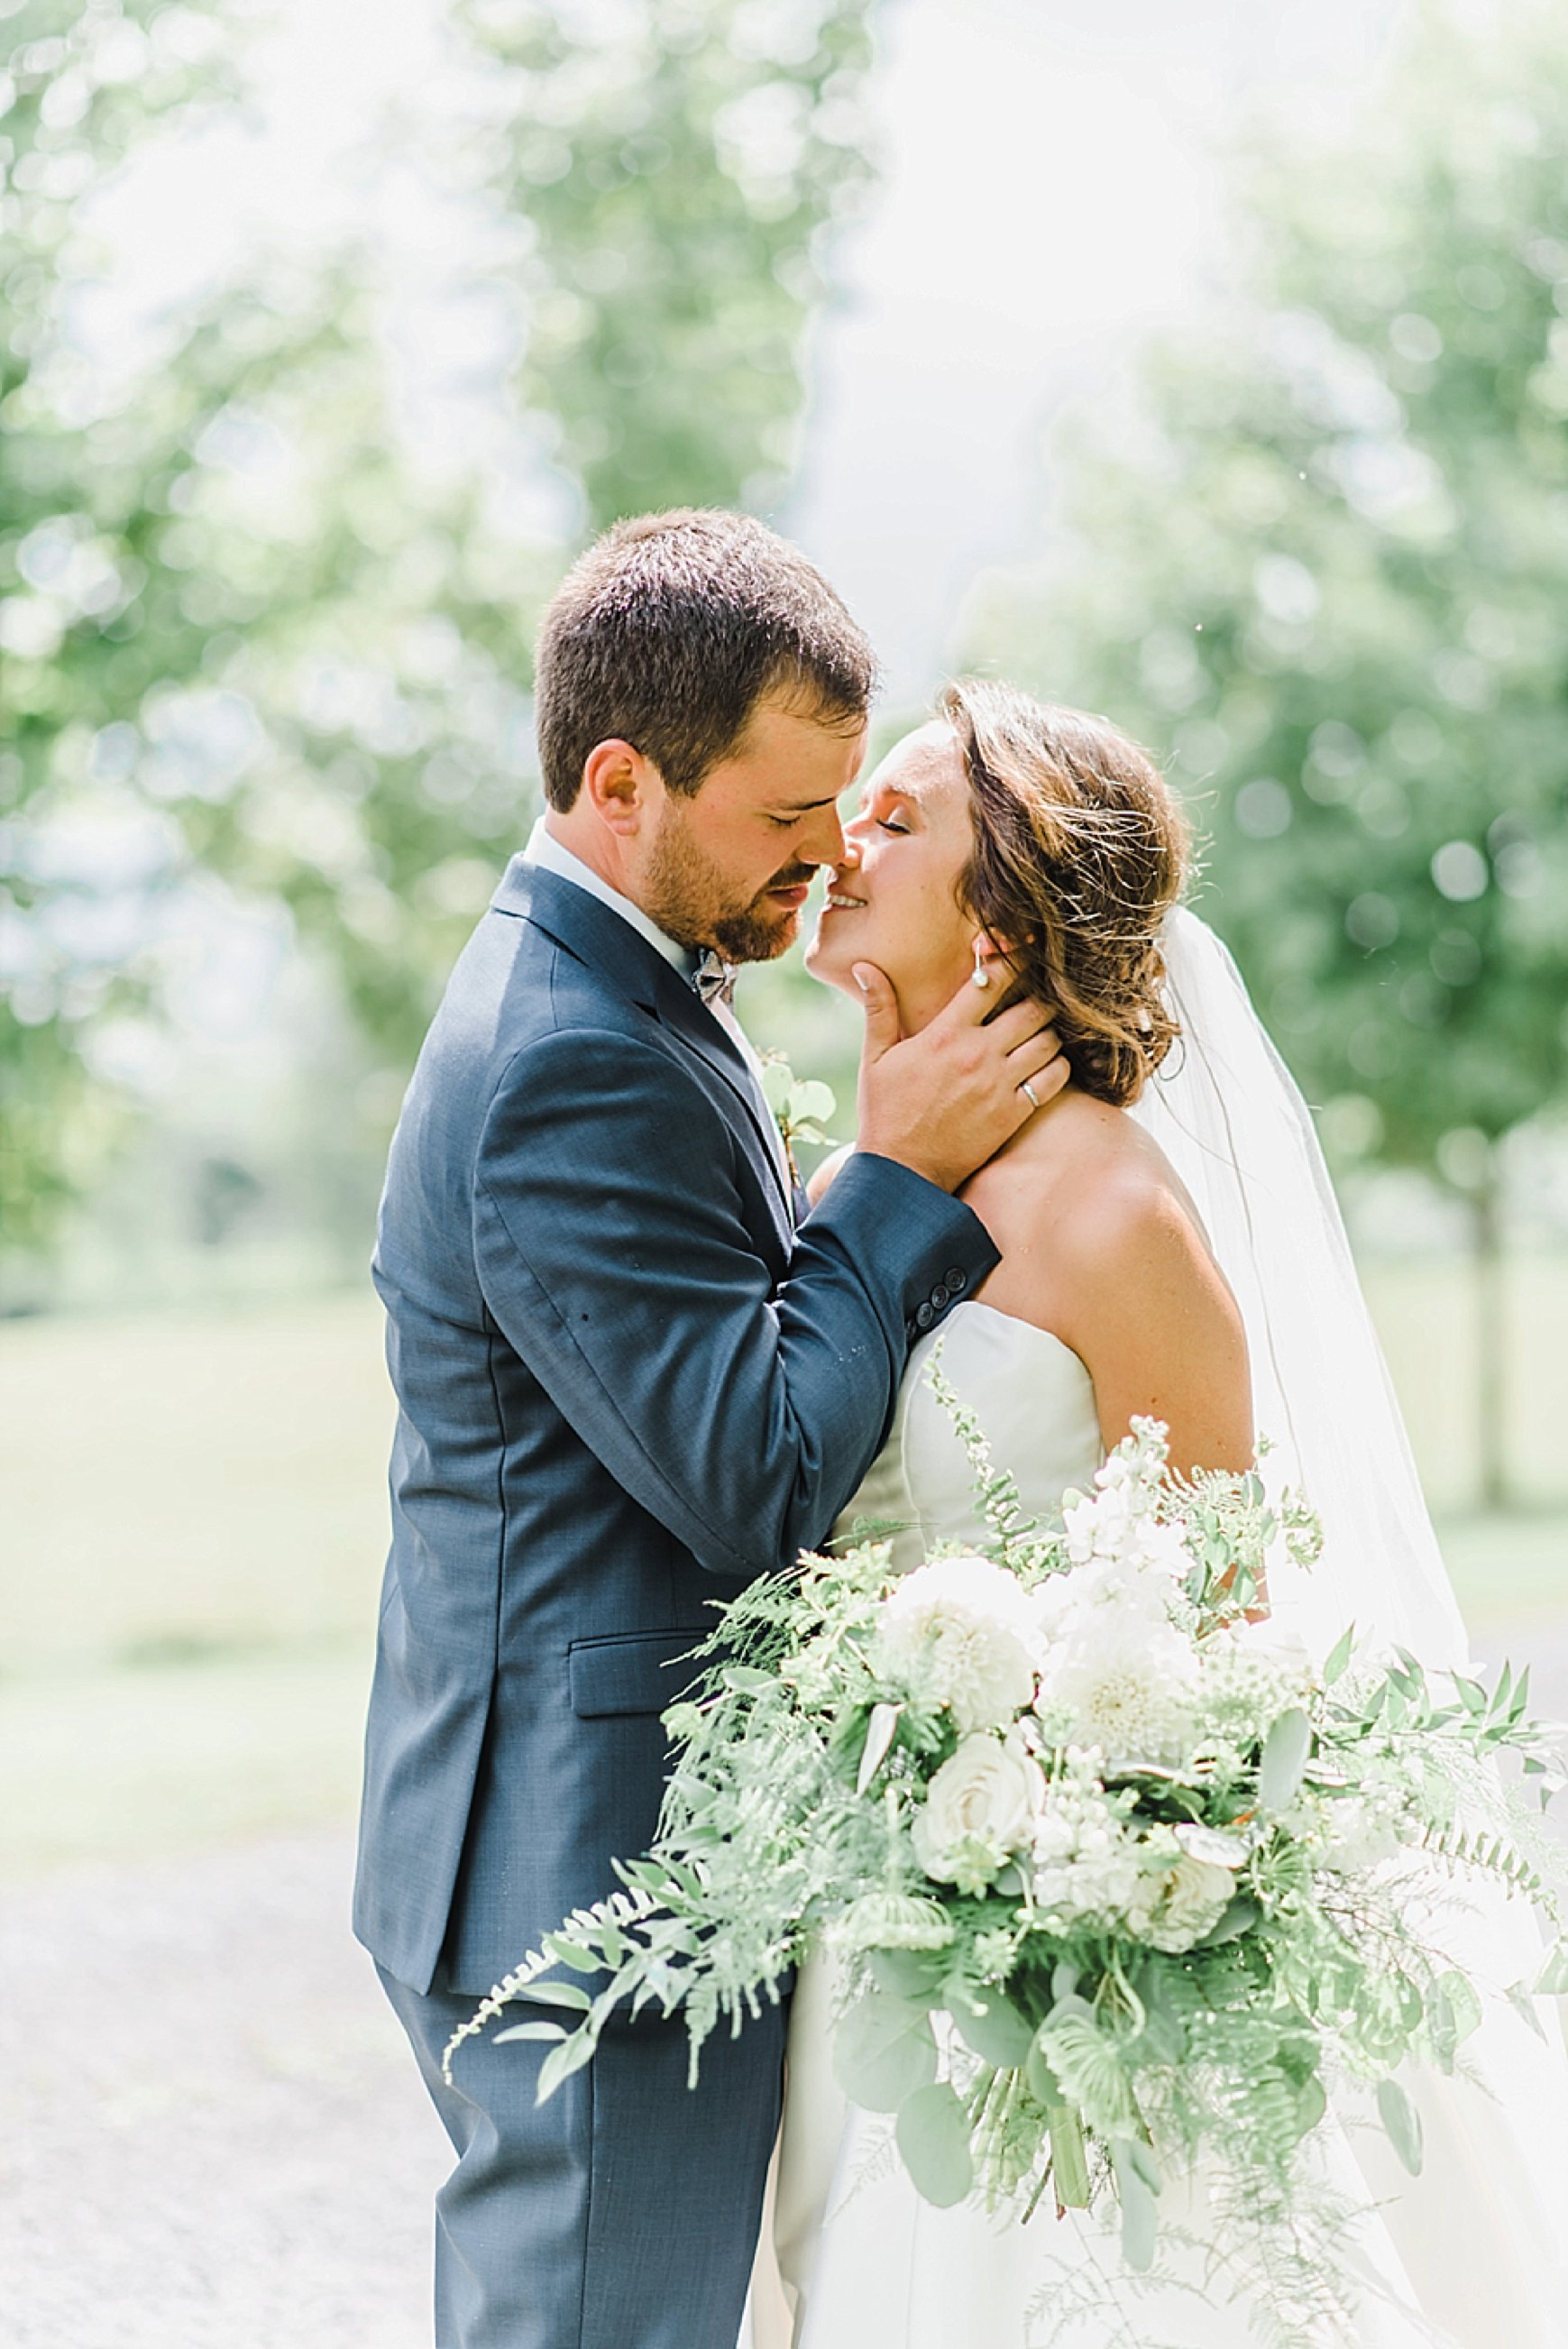 light airy indie fine art ottawa wedding photographer | Ali and Batoul Photography_0507.jpg